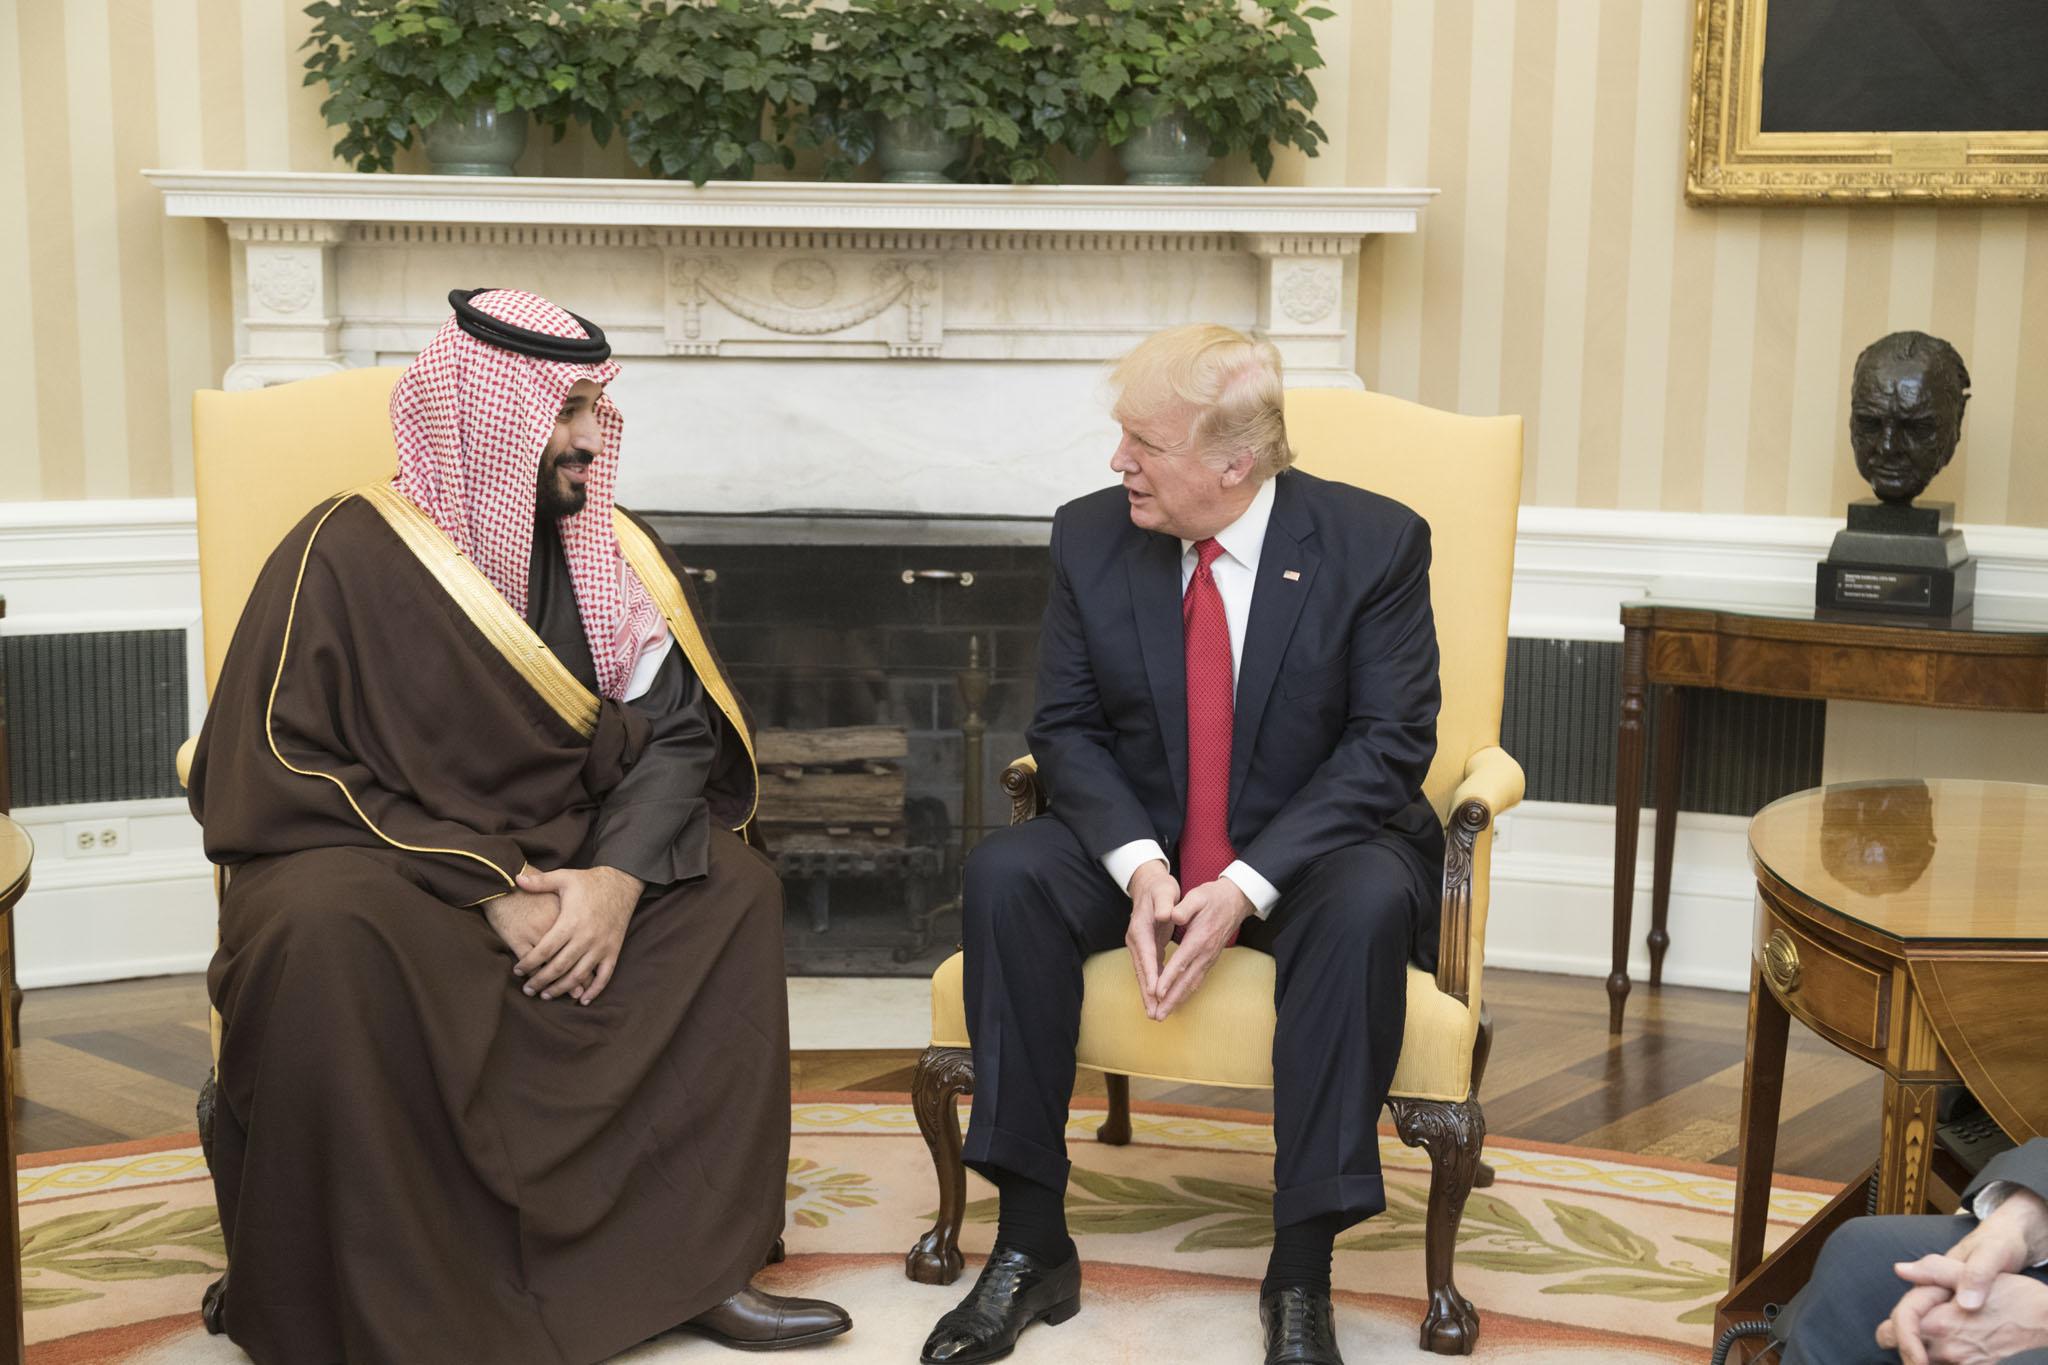 Senate Will Try To Override Trump's Veto On Saudi Arms Sales